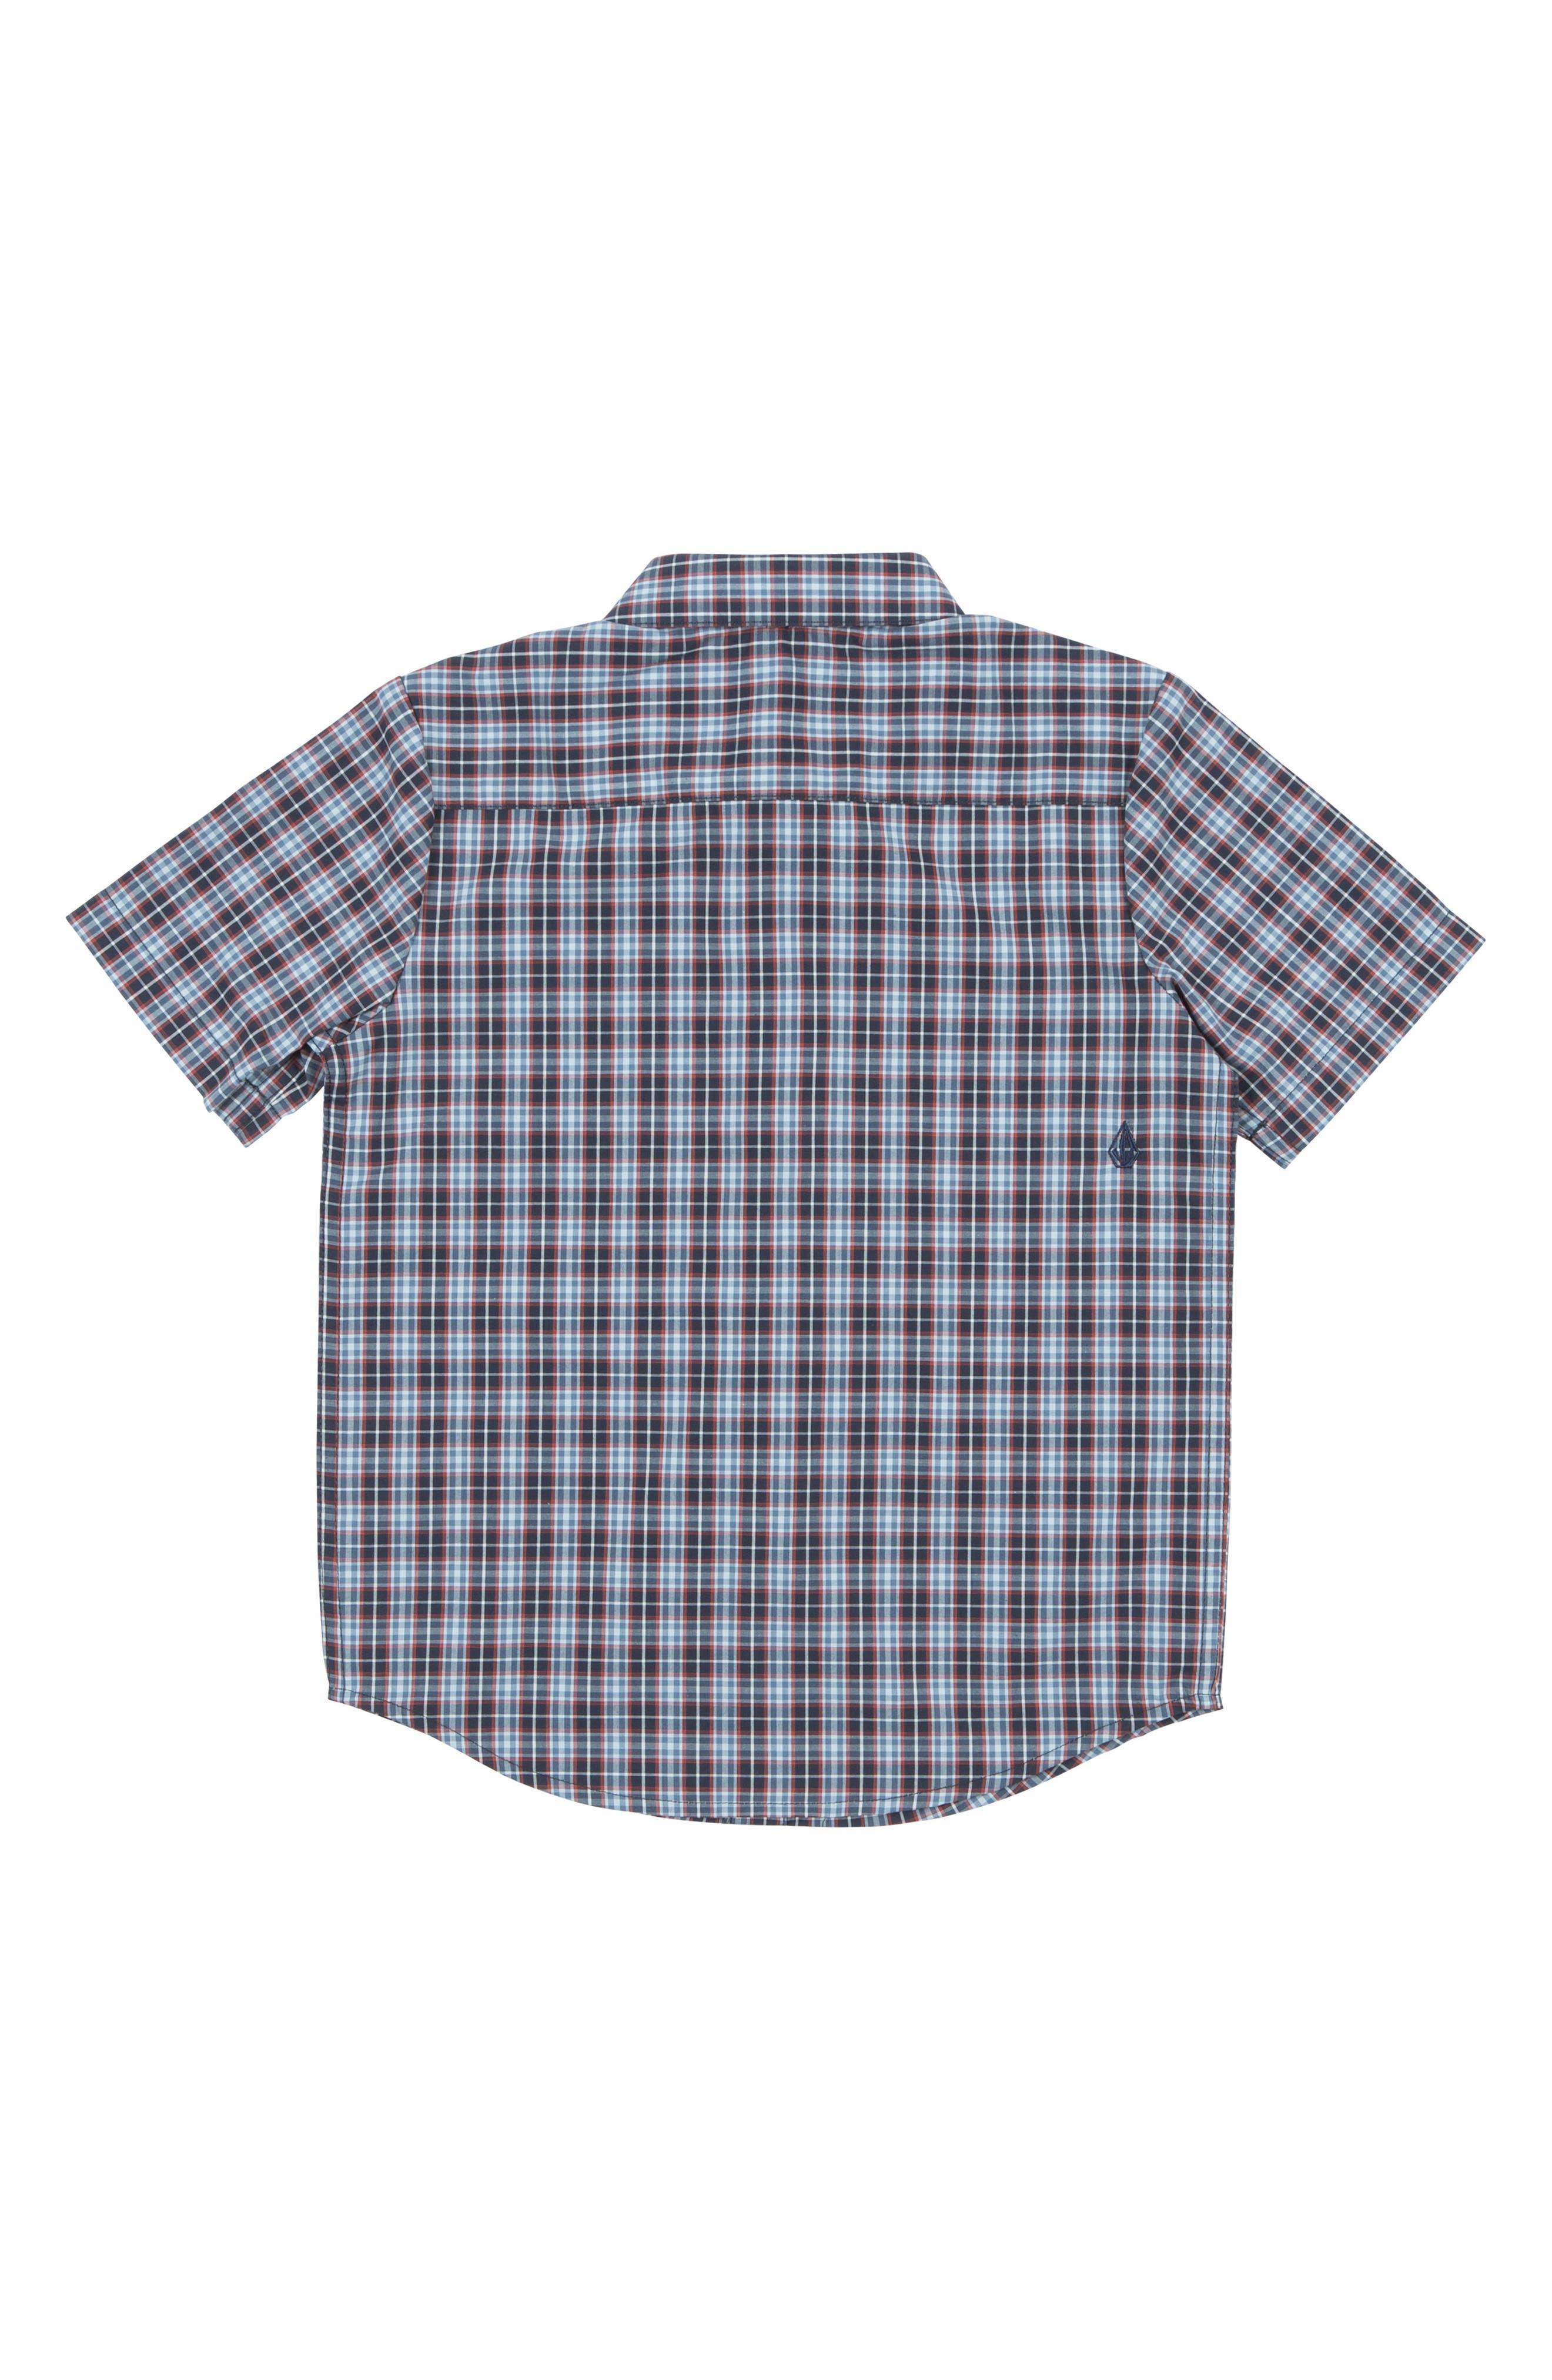 Harper Plaid Woven Shirt,                             Main thumbnail 1, color,                             410